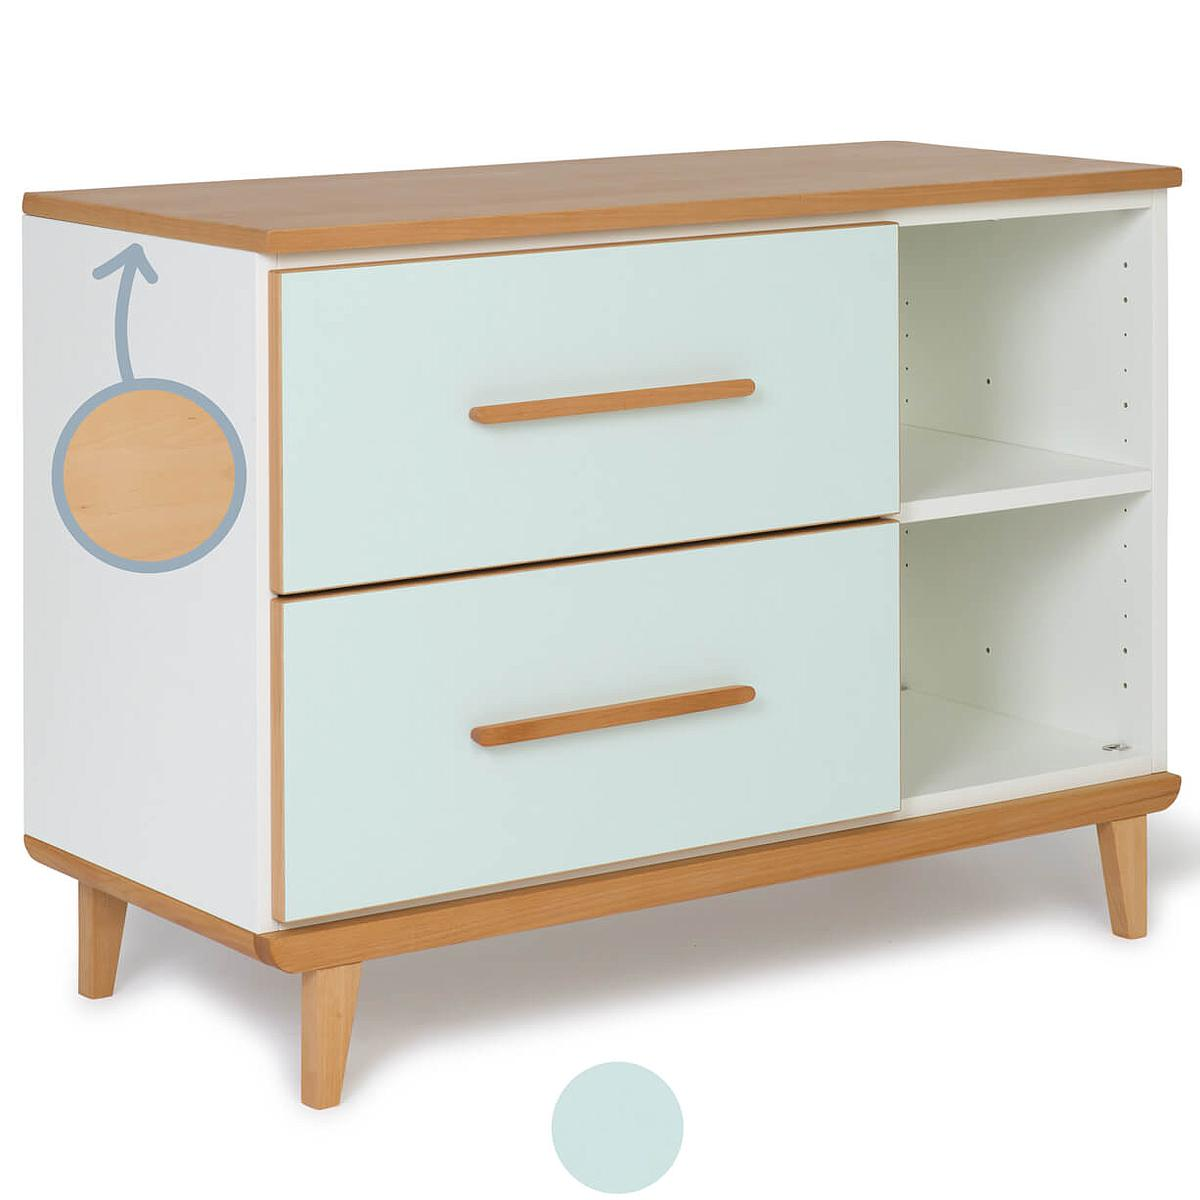 Mueble pequeño 2 cajones NADO mint